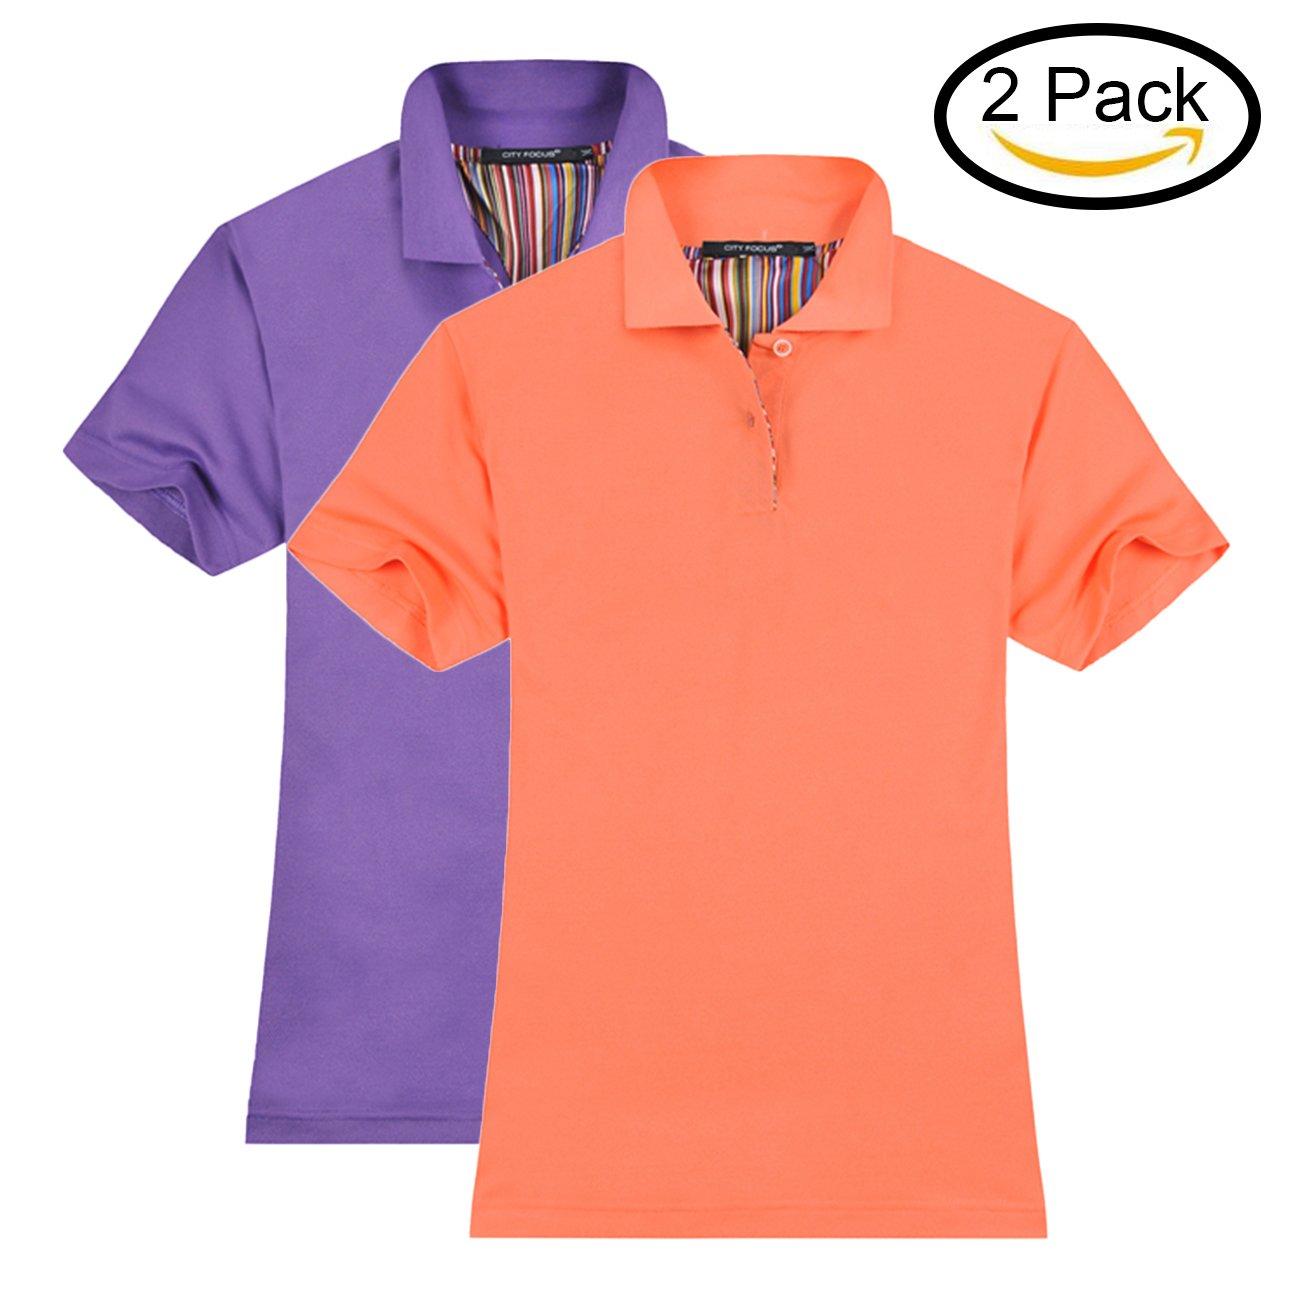 MTTROLI Womens Polo Shirts, Ladies Stretch Polo Shirts Short Sleeve Tops Workwear Pack Of 2